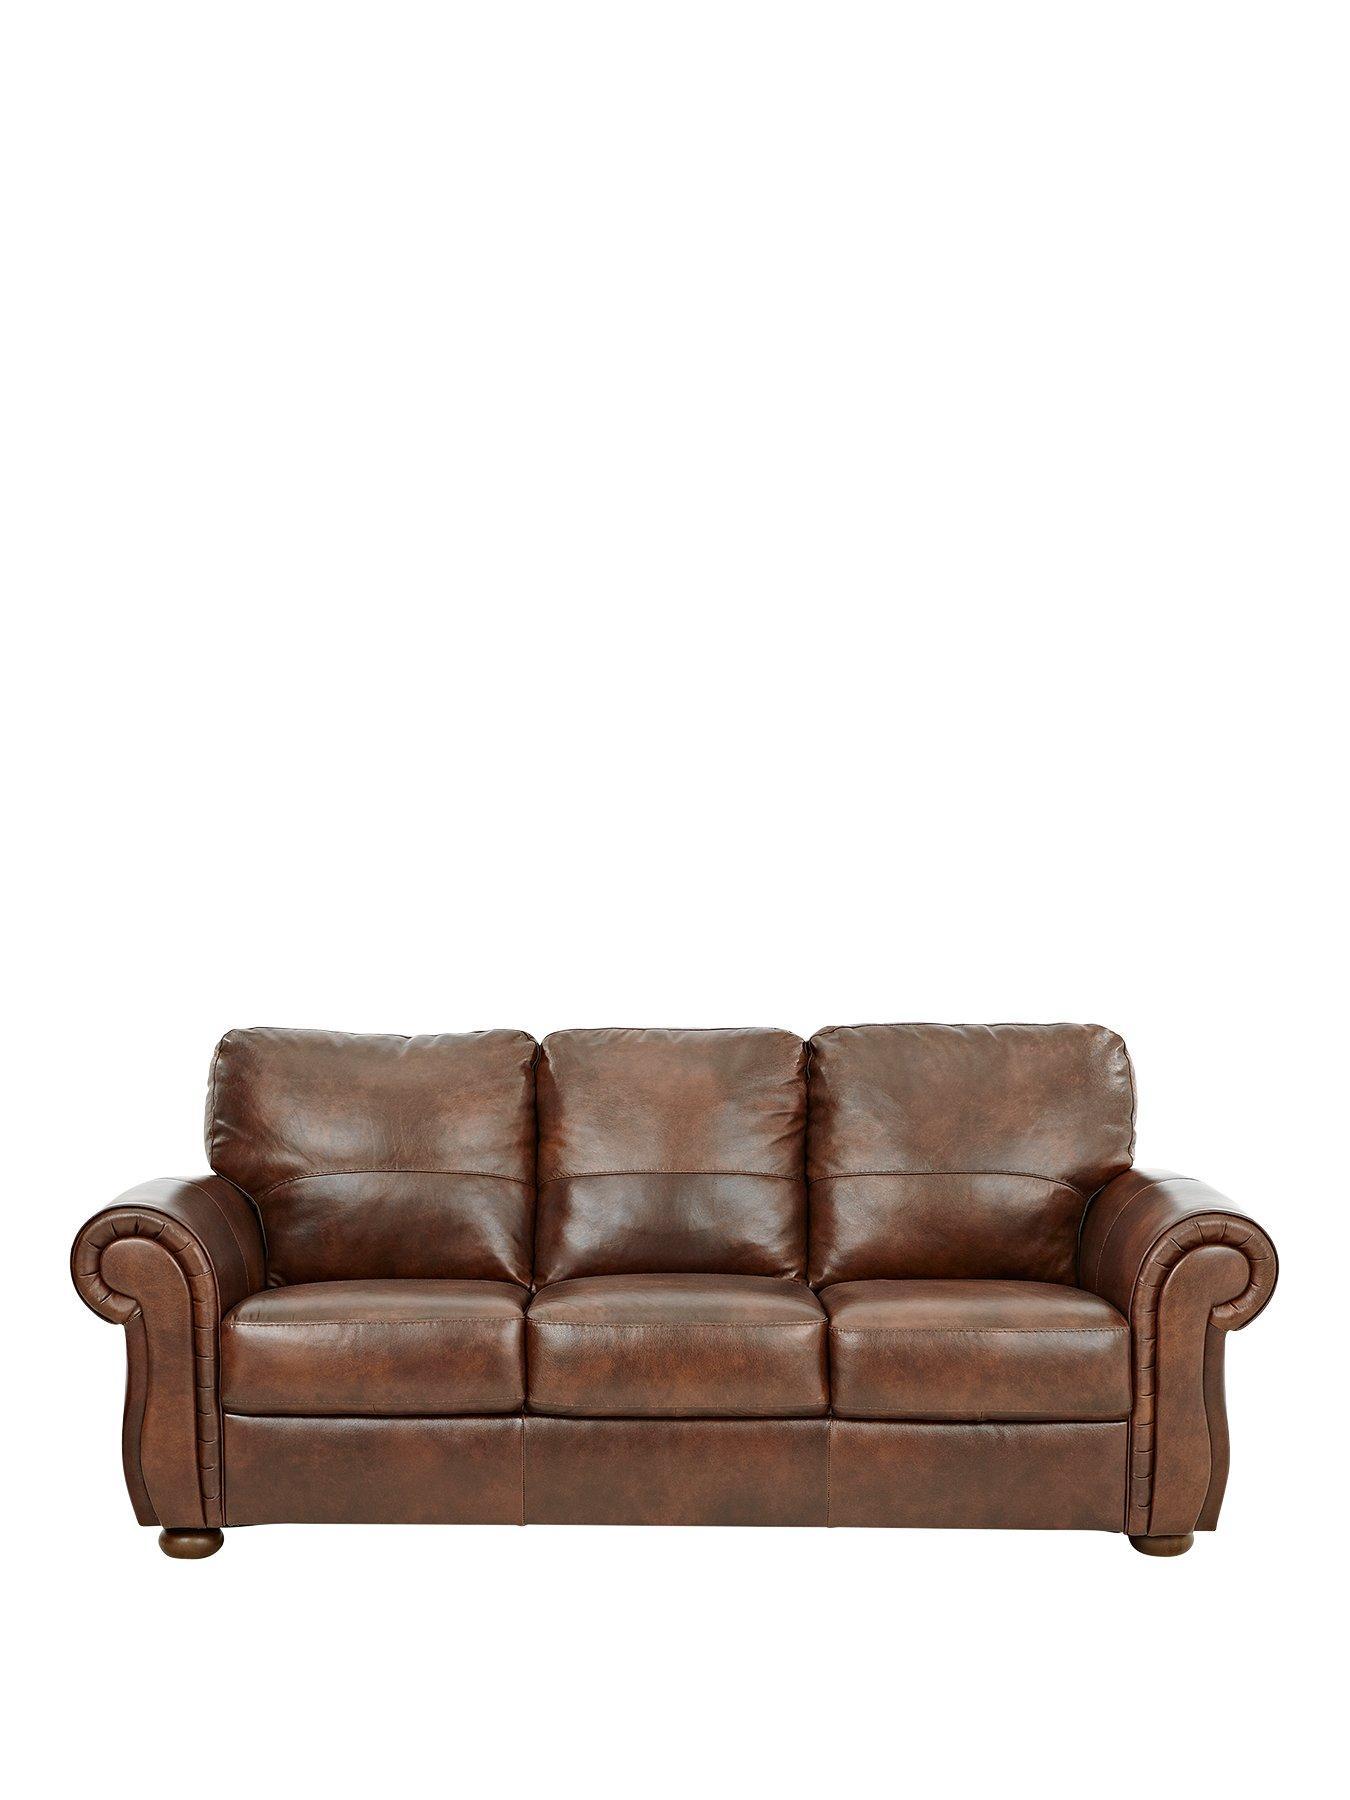 italy leather sofa uk victorian parlor cassina italian 3 seater very co